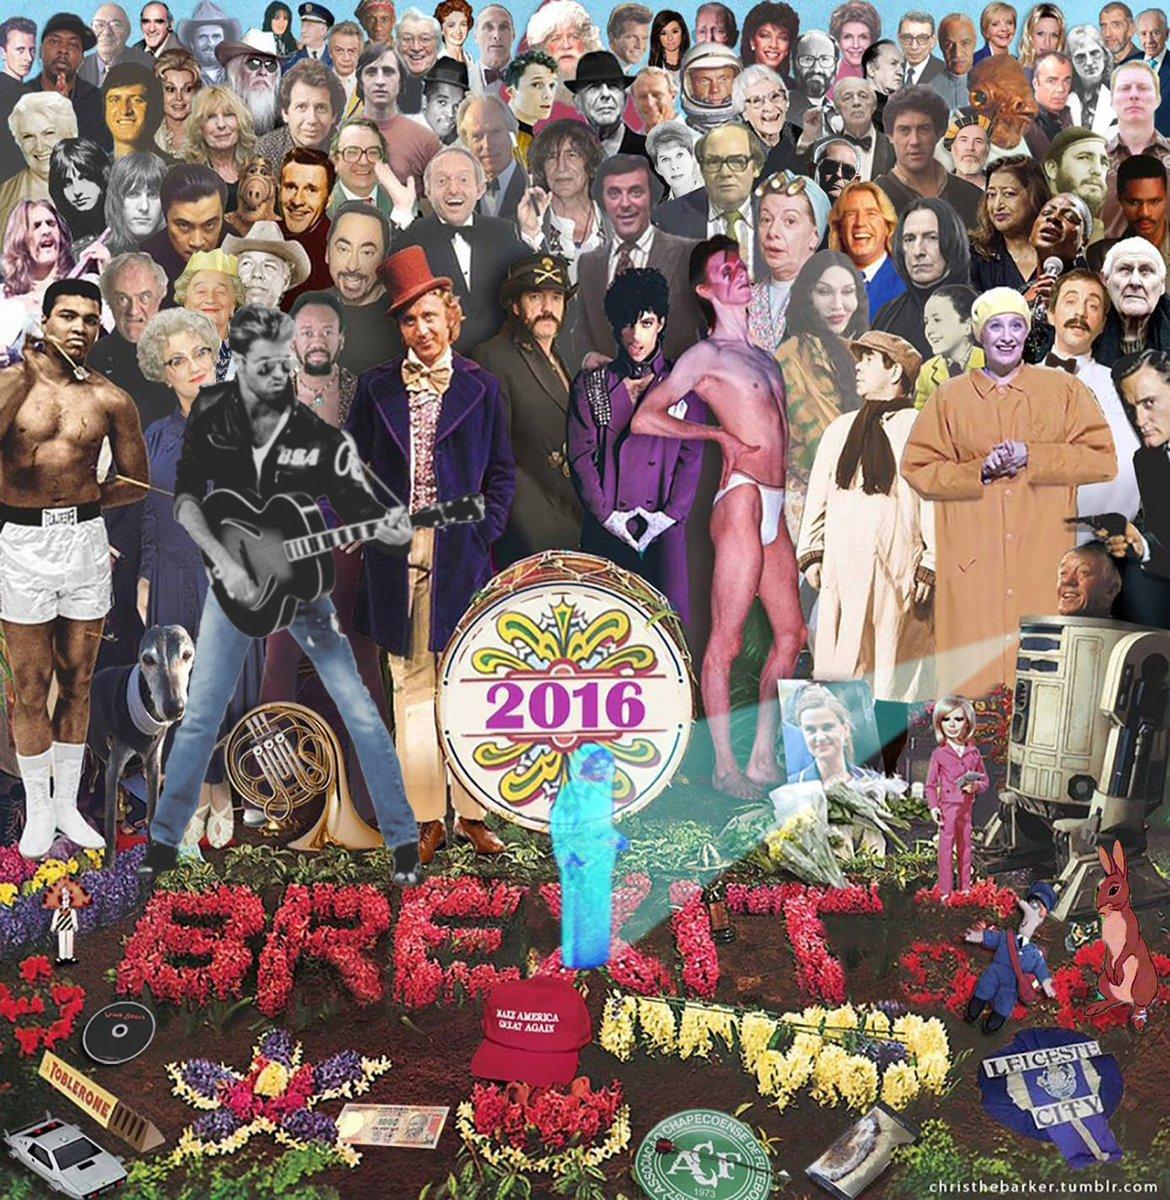 Un Automne 2016